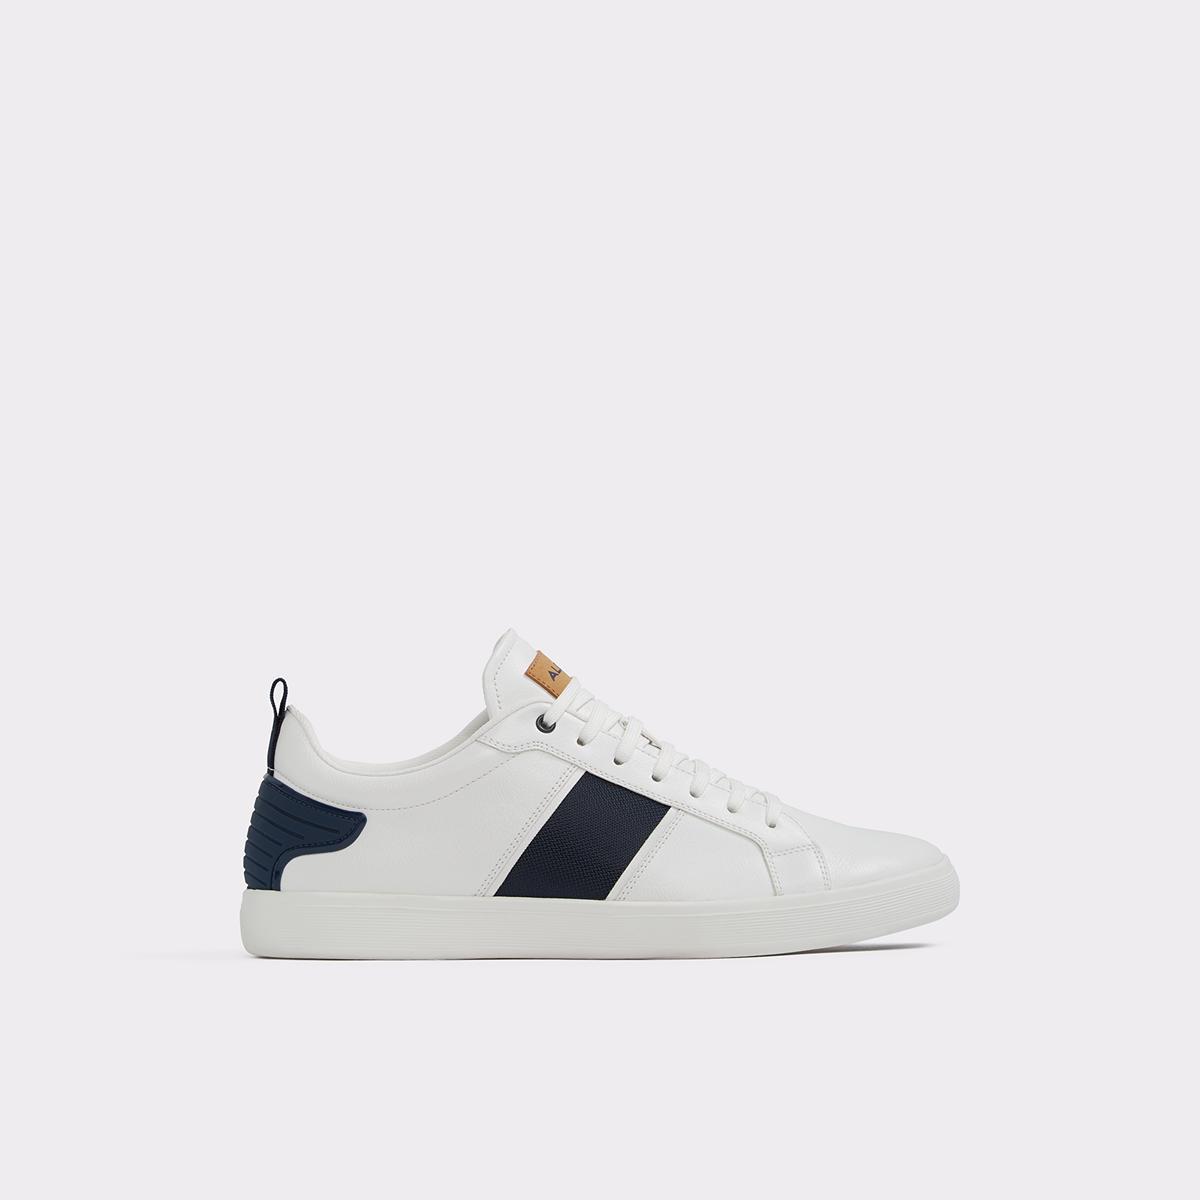 41c73c2210da Olardon White Men s Sneakers